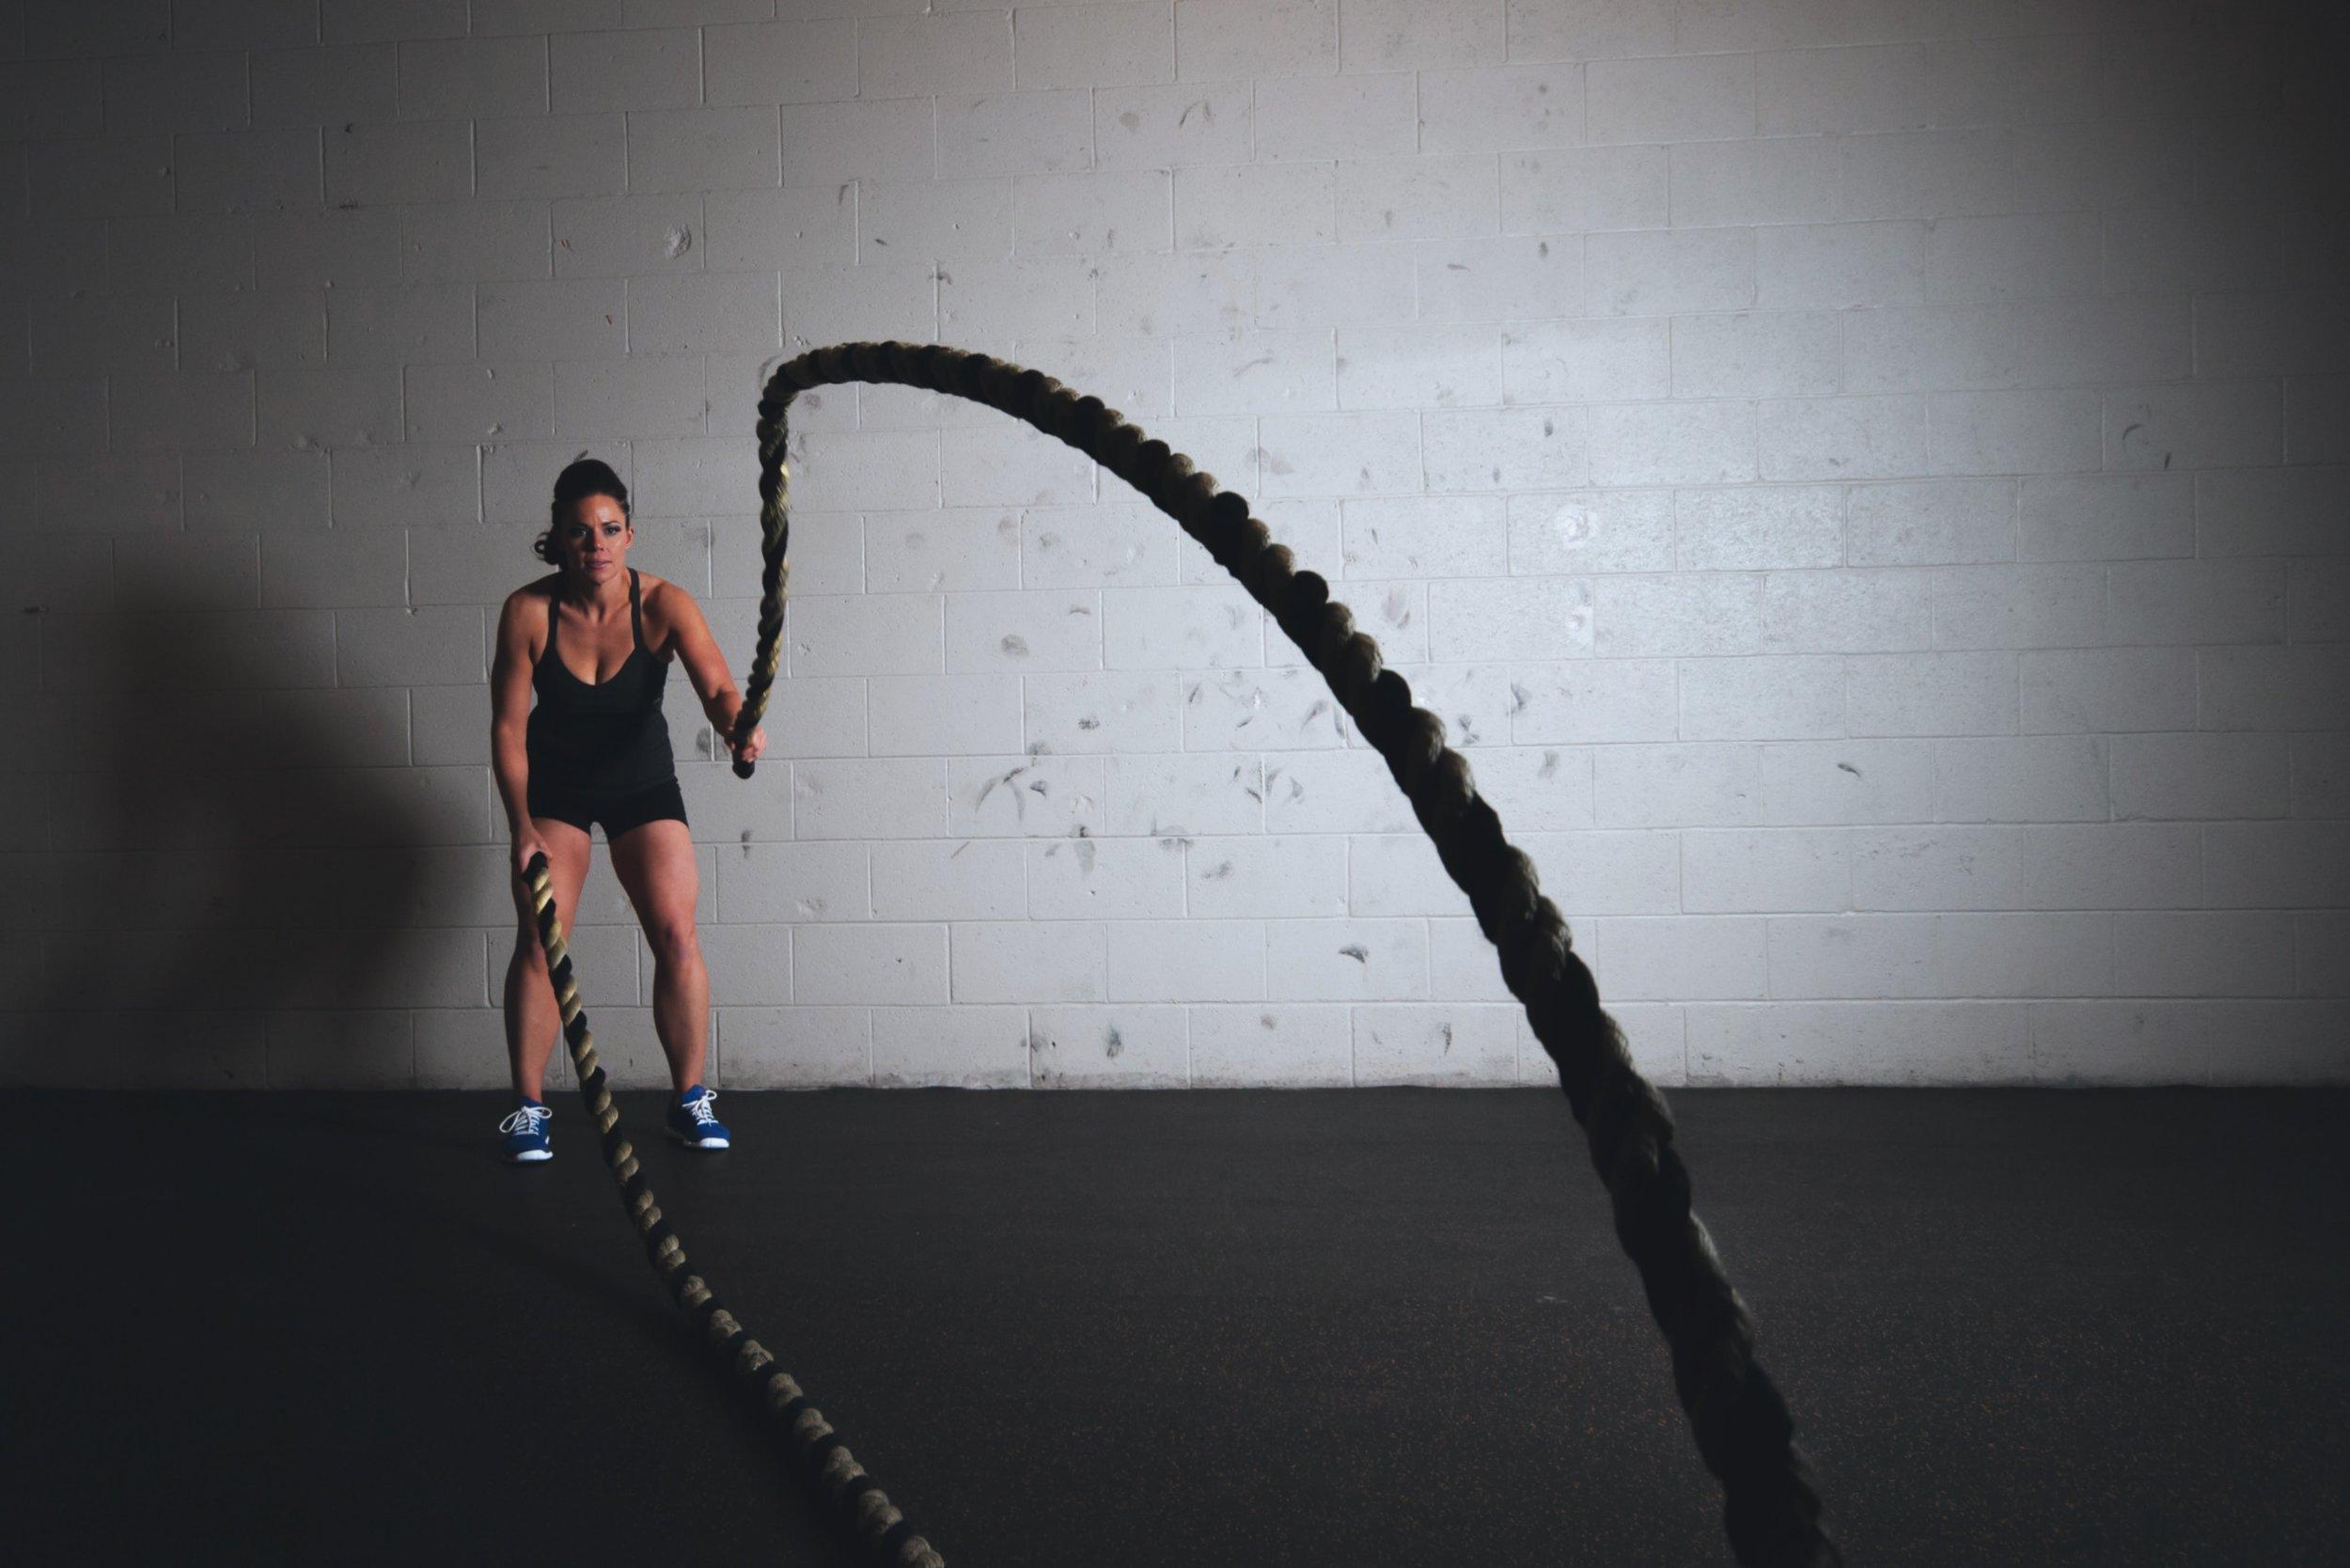 crossfit-fitness-gym-28080.jpg